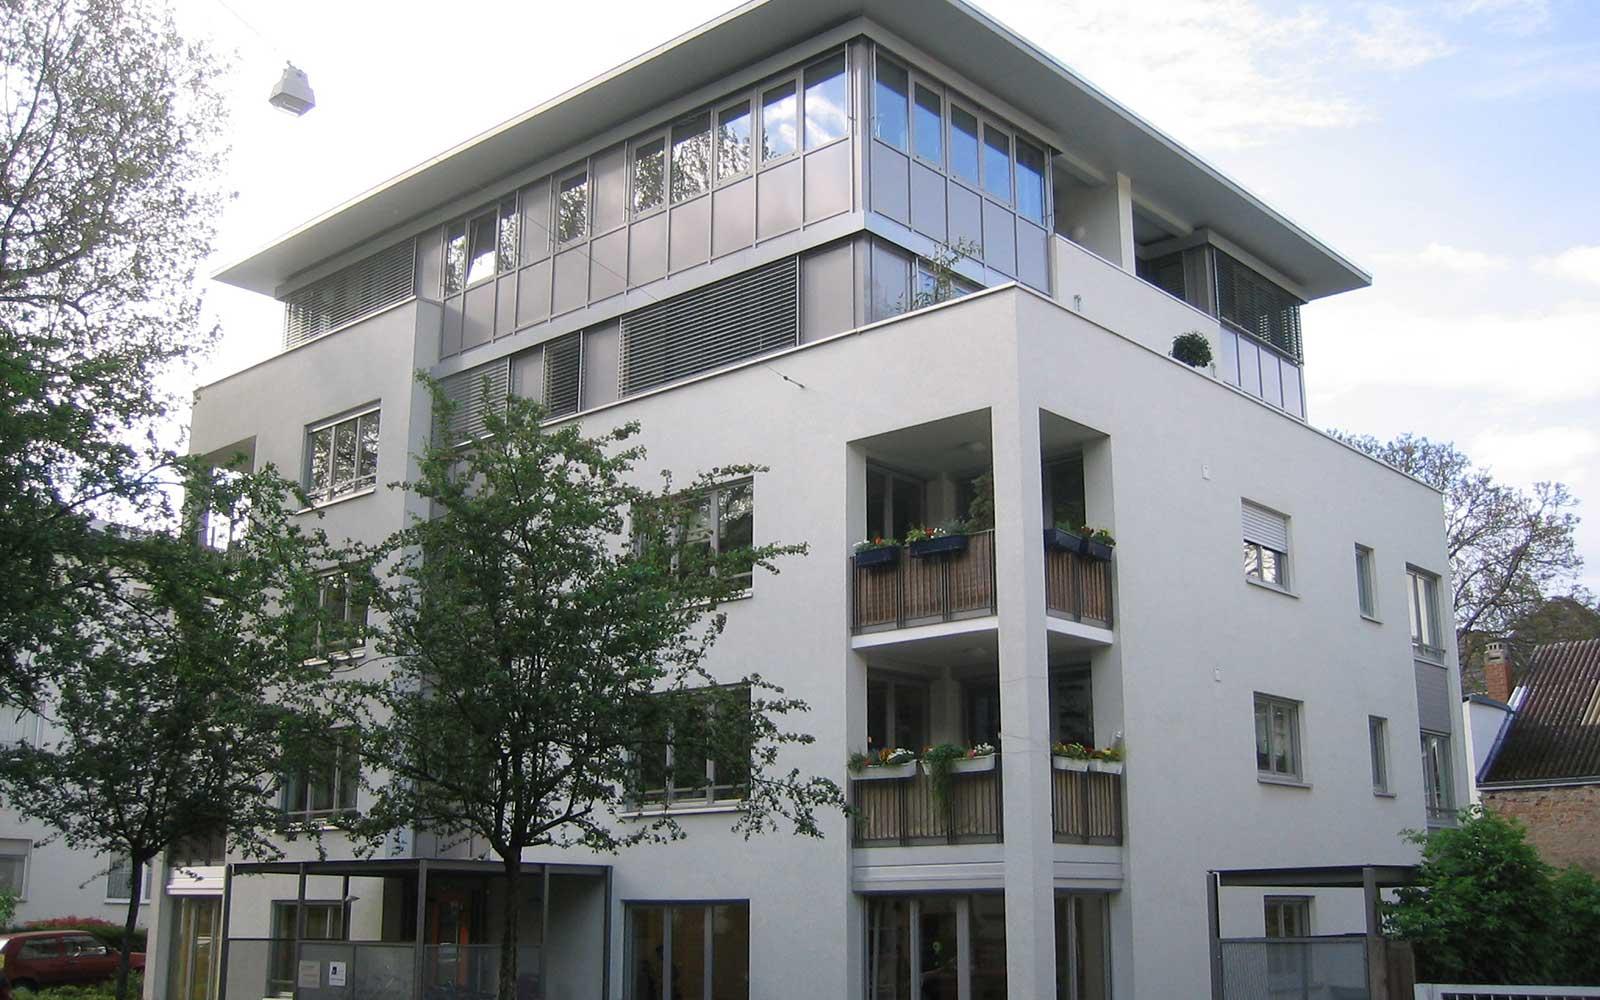 weststadt heidelberg kochhan weckbach architekten heidelberg. Black Bedroom Furniture Sets. Home Design Ideas